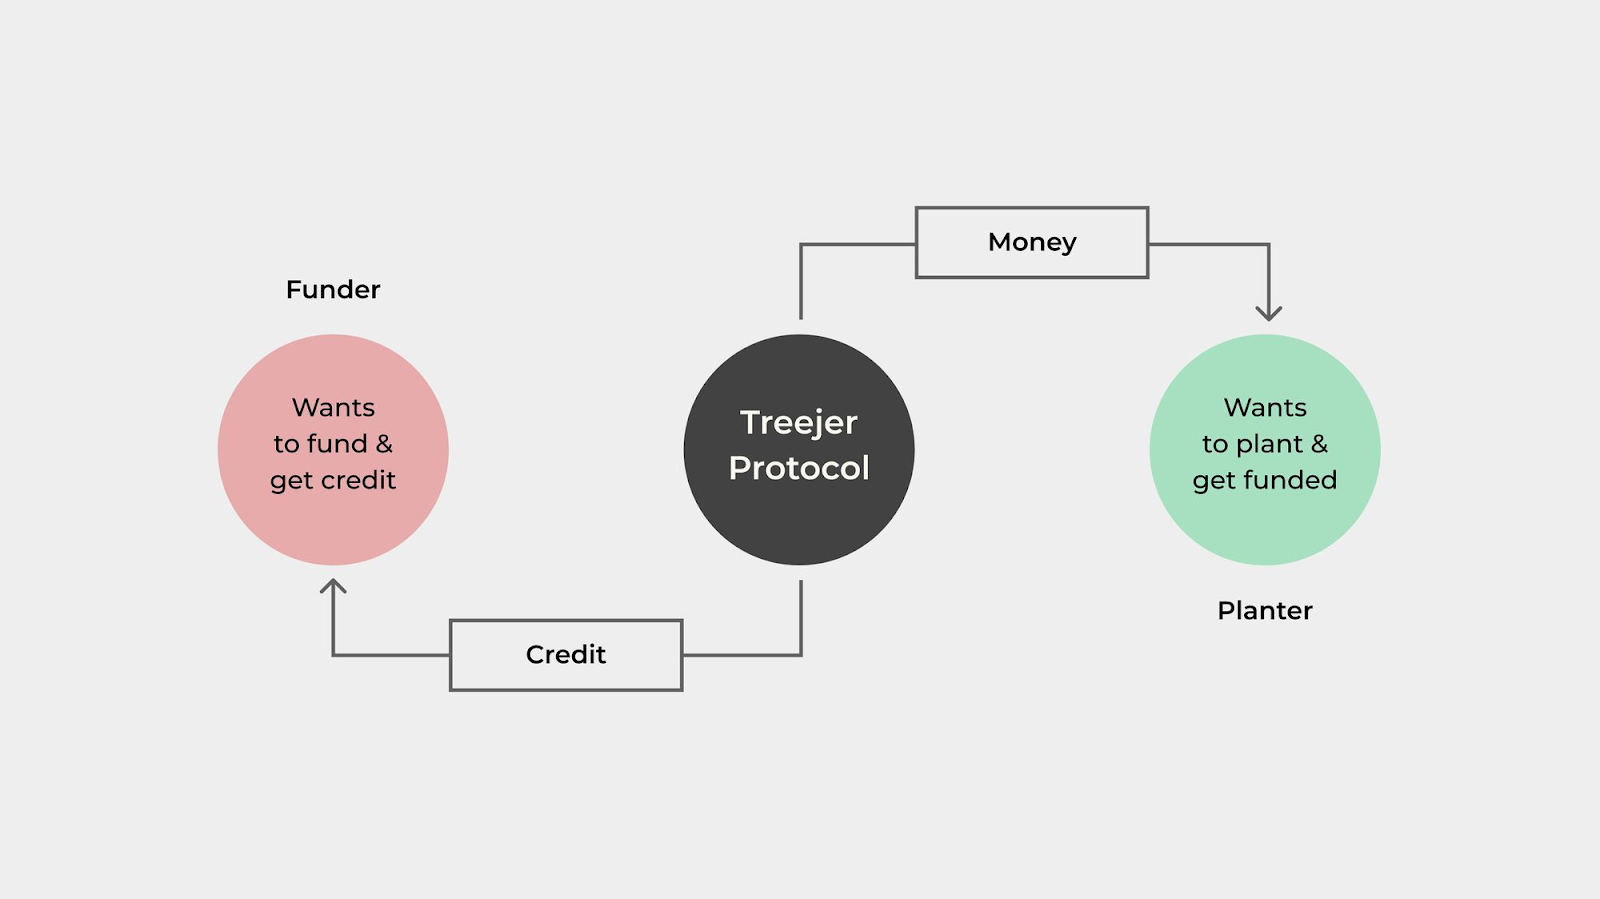 Treejer protocol